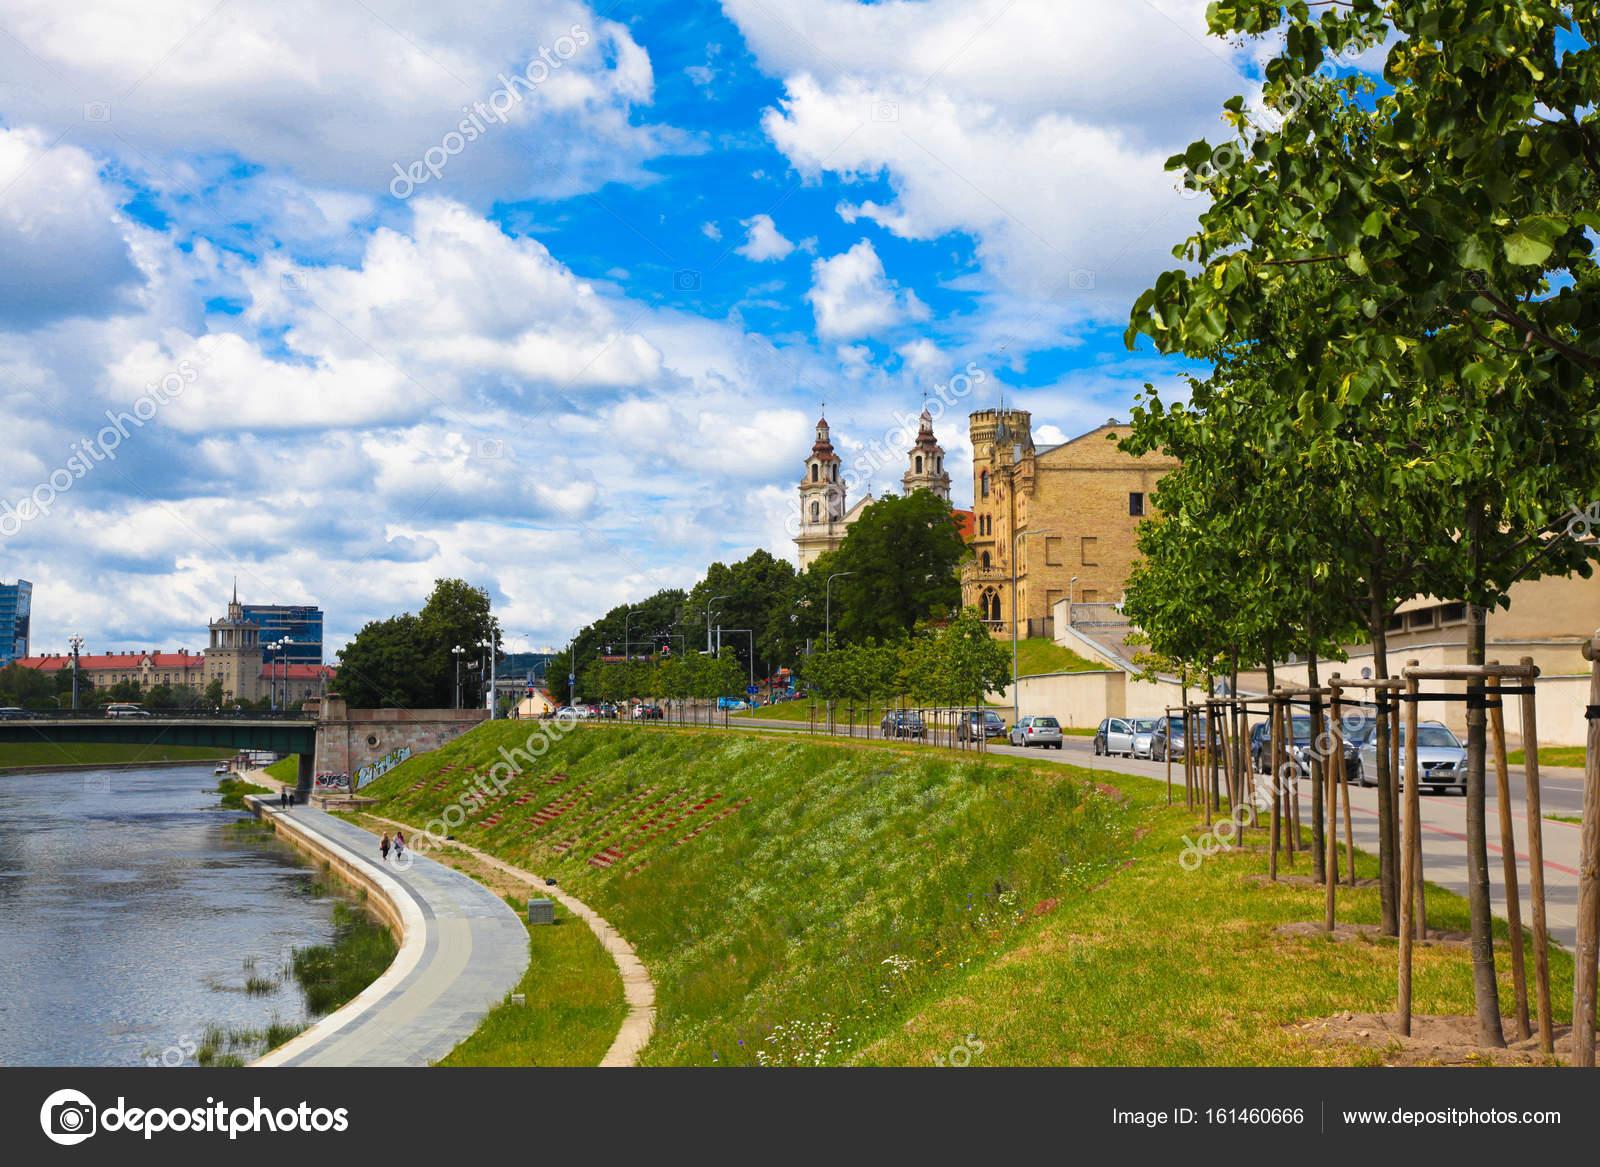 37121d18553 Βίλνιους, Λιθουανία 08 Ιουλίου 2016: καθολικός ναός του Αγίου Ραφαήλ και  θέα στον ποταμό Neris, Βίλνιους Λιθουανίας — Εικόνα από SophiDante